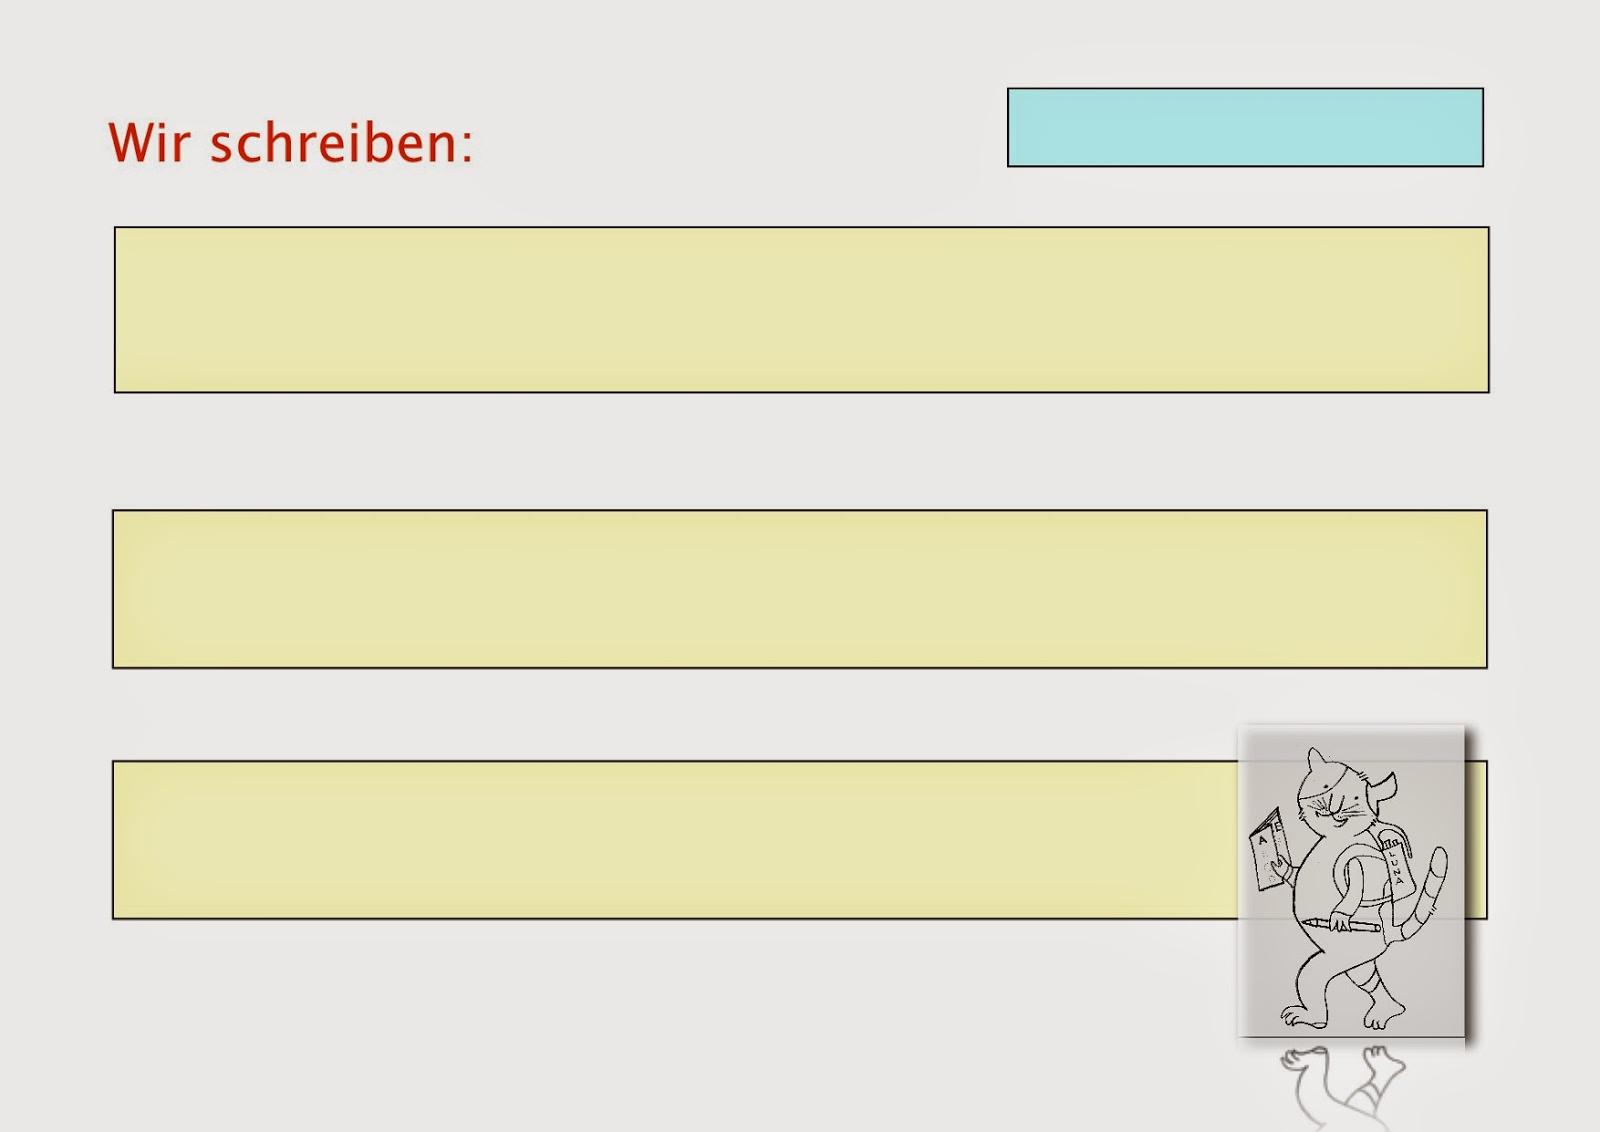 Tafelbild Pluminchen | Frau Lukas bloggt